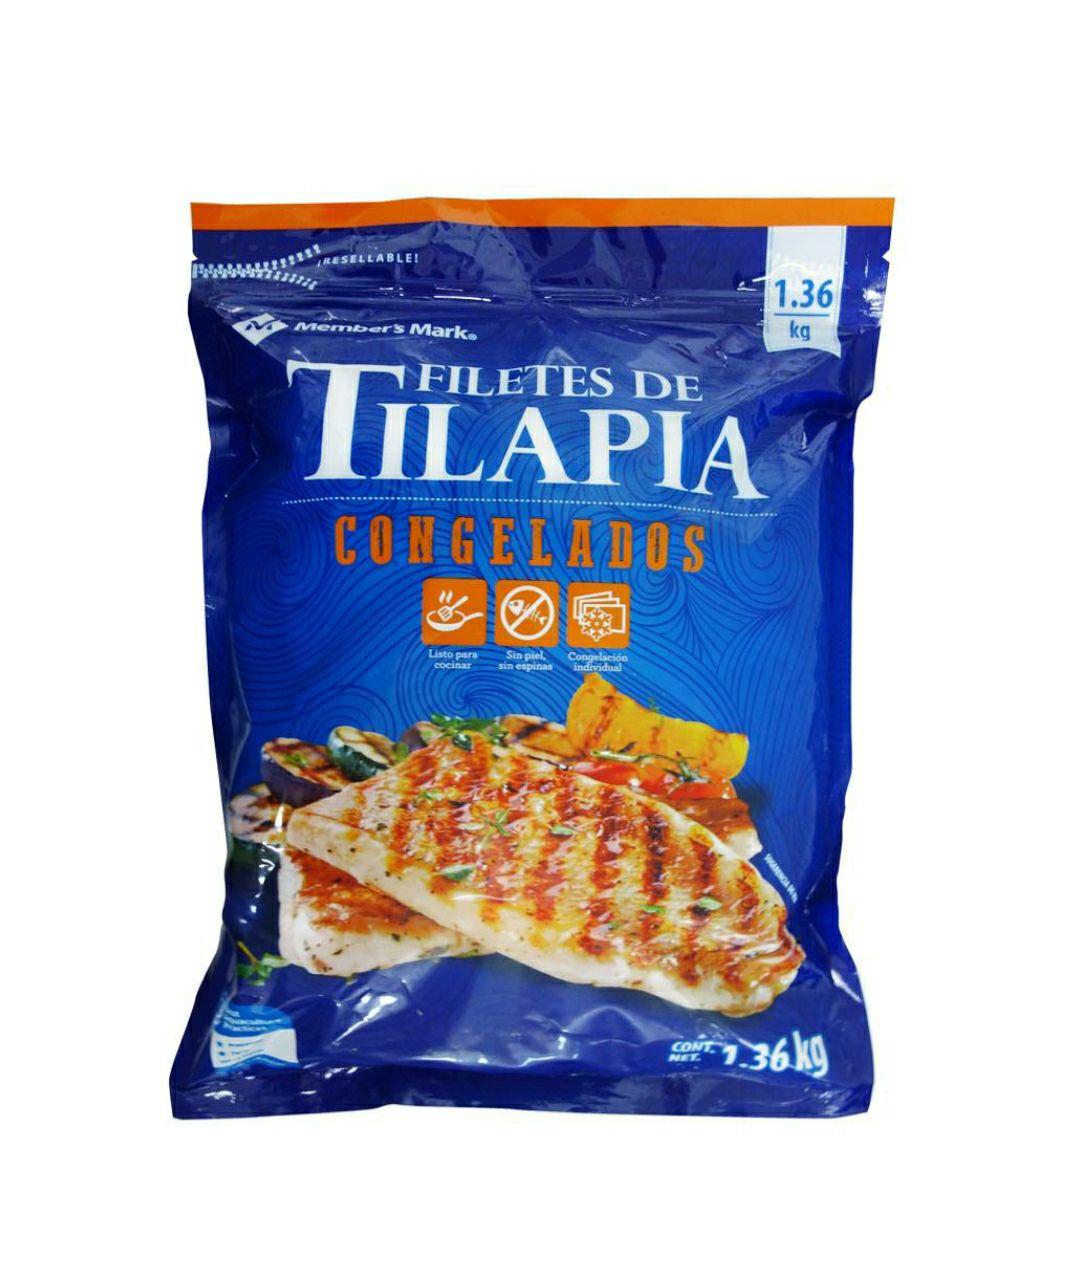 Sams Club: Filete De Tilapia Member's Mark 1.36kg.